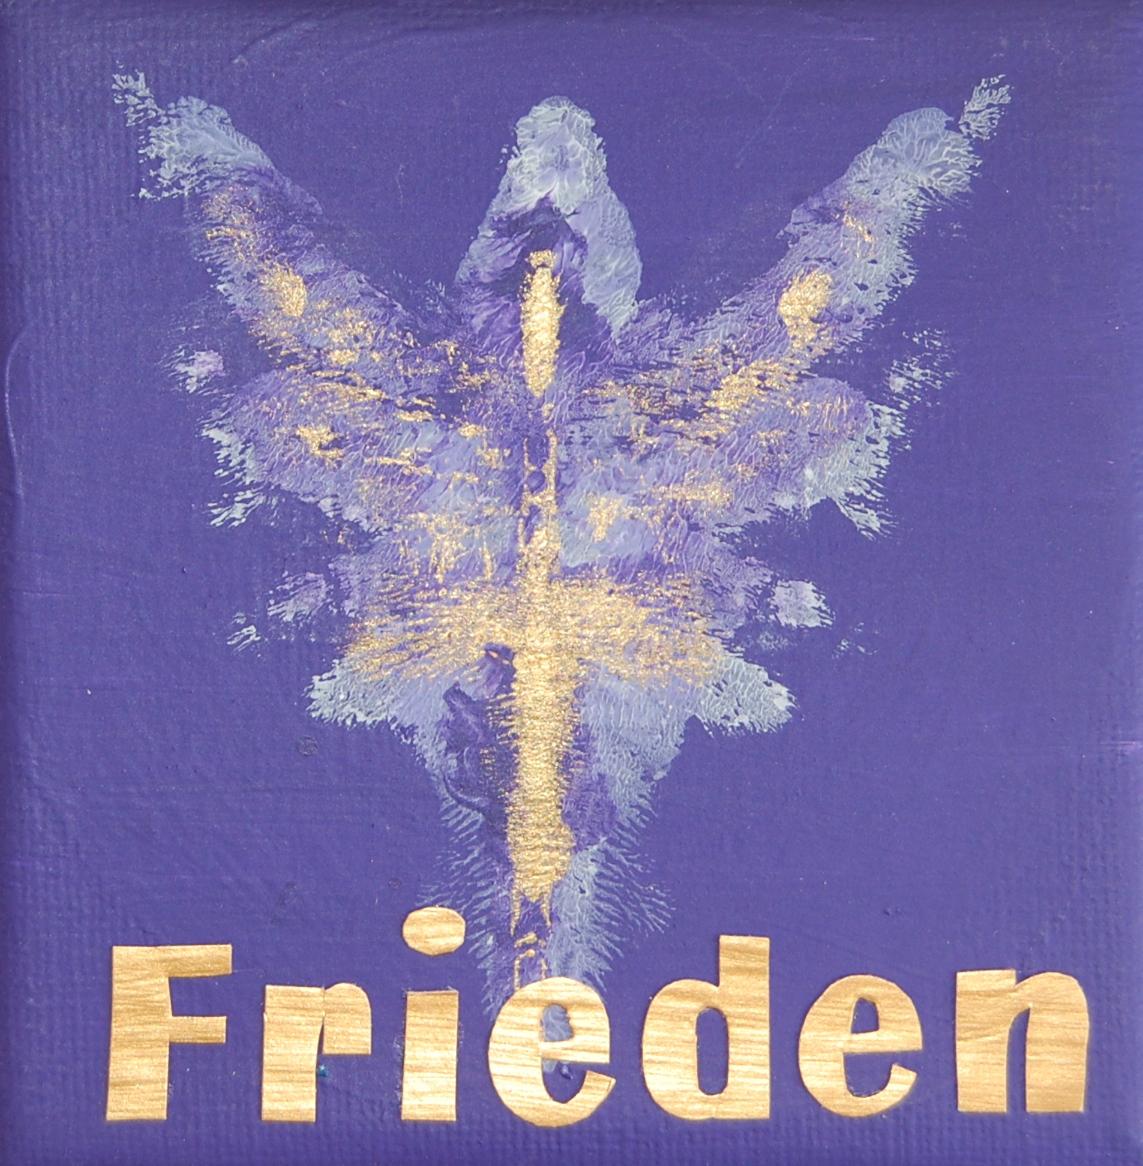 Engel des Friedens 10 x 10 cm